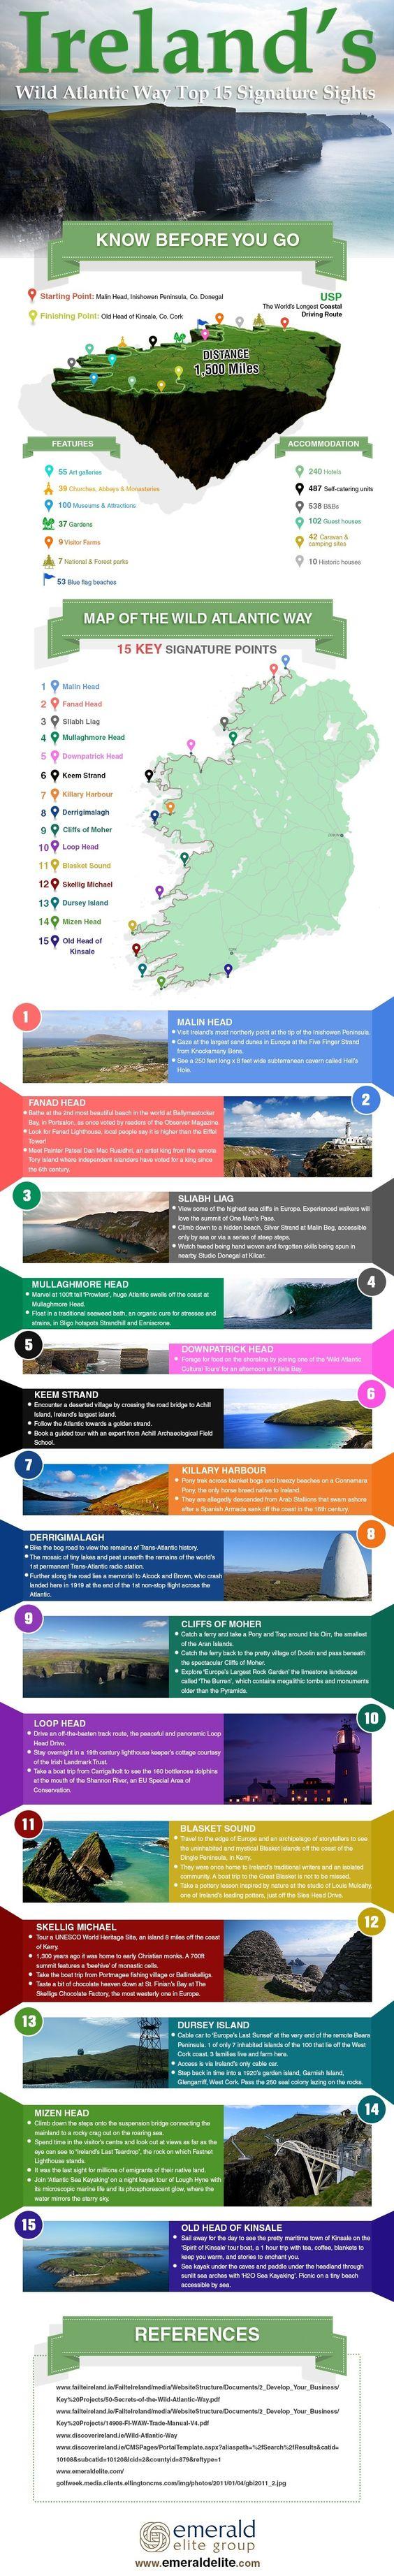 Ireland Hot Spots